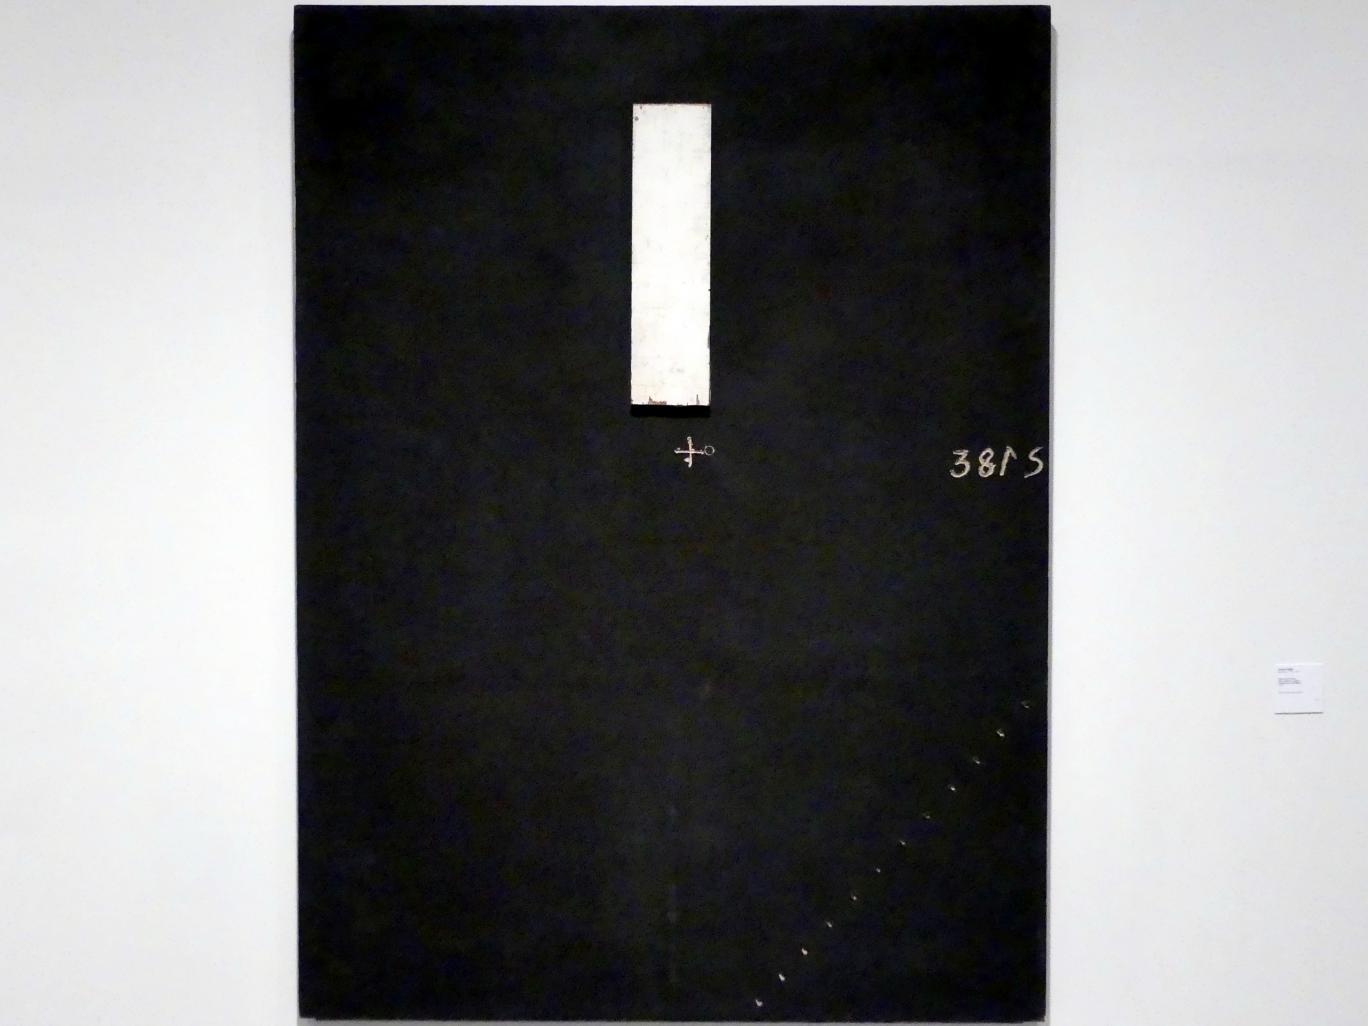 Antoni Tàpies: Großes Braun und Holz, 1975